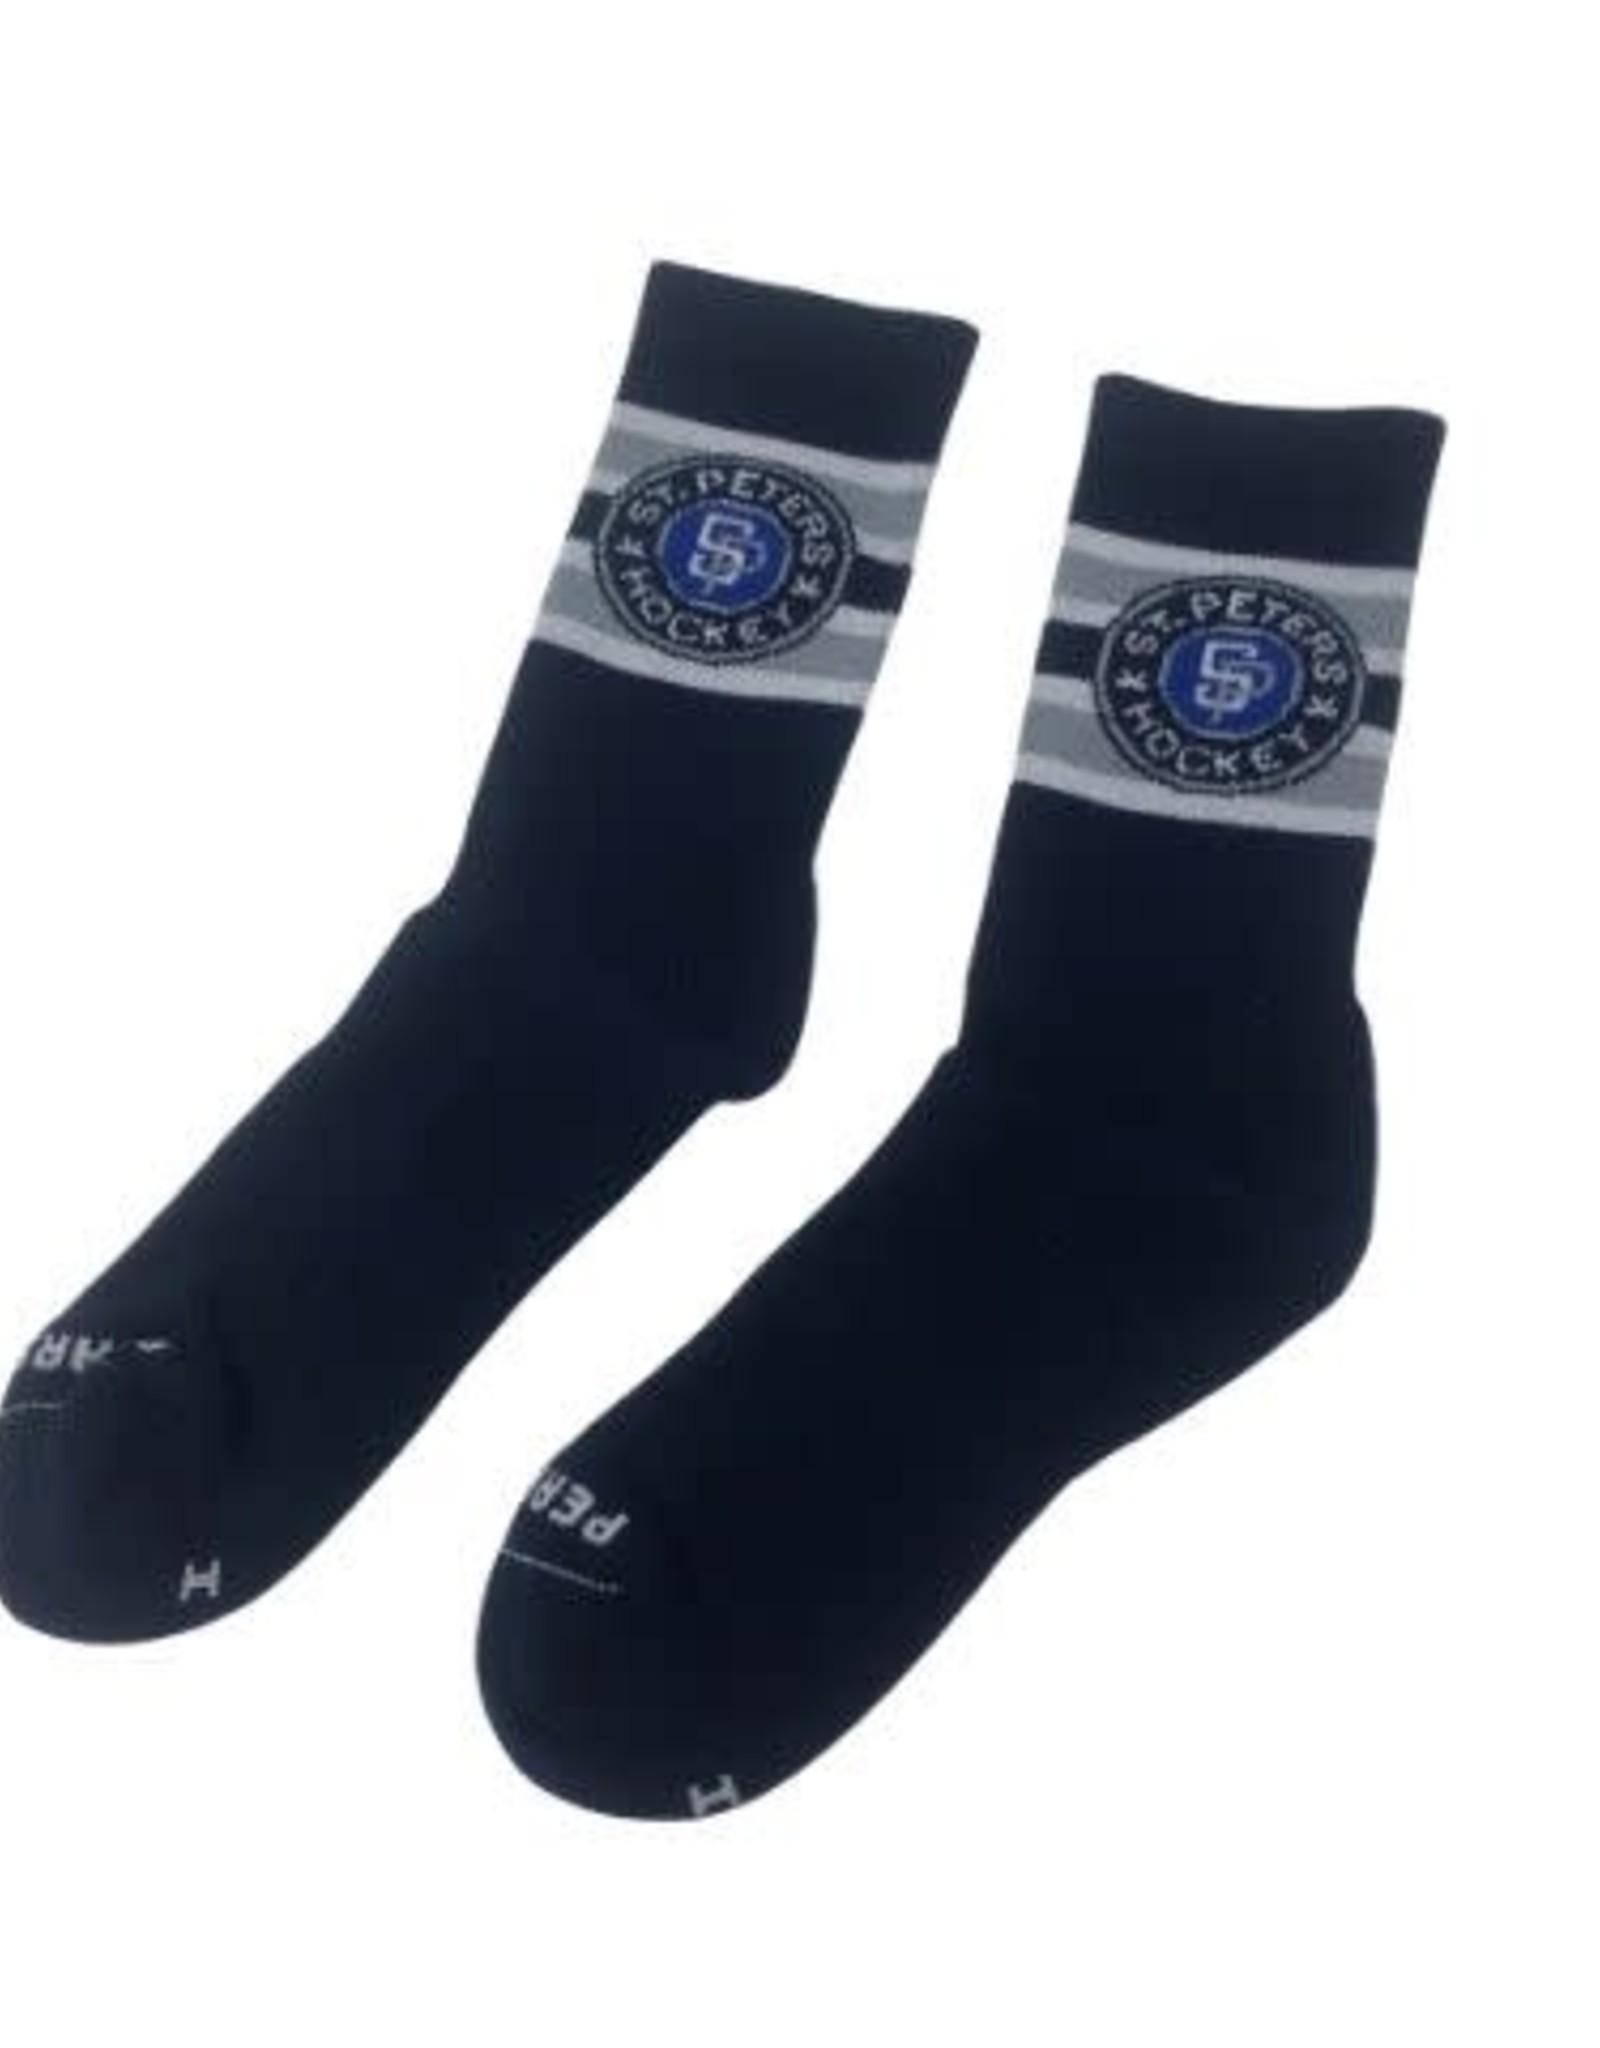 Pear Sox STP Skate Sock (ADULT) Navy